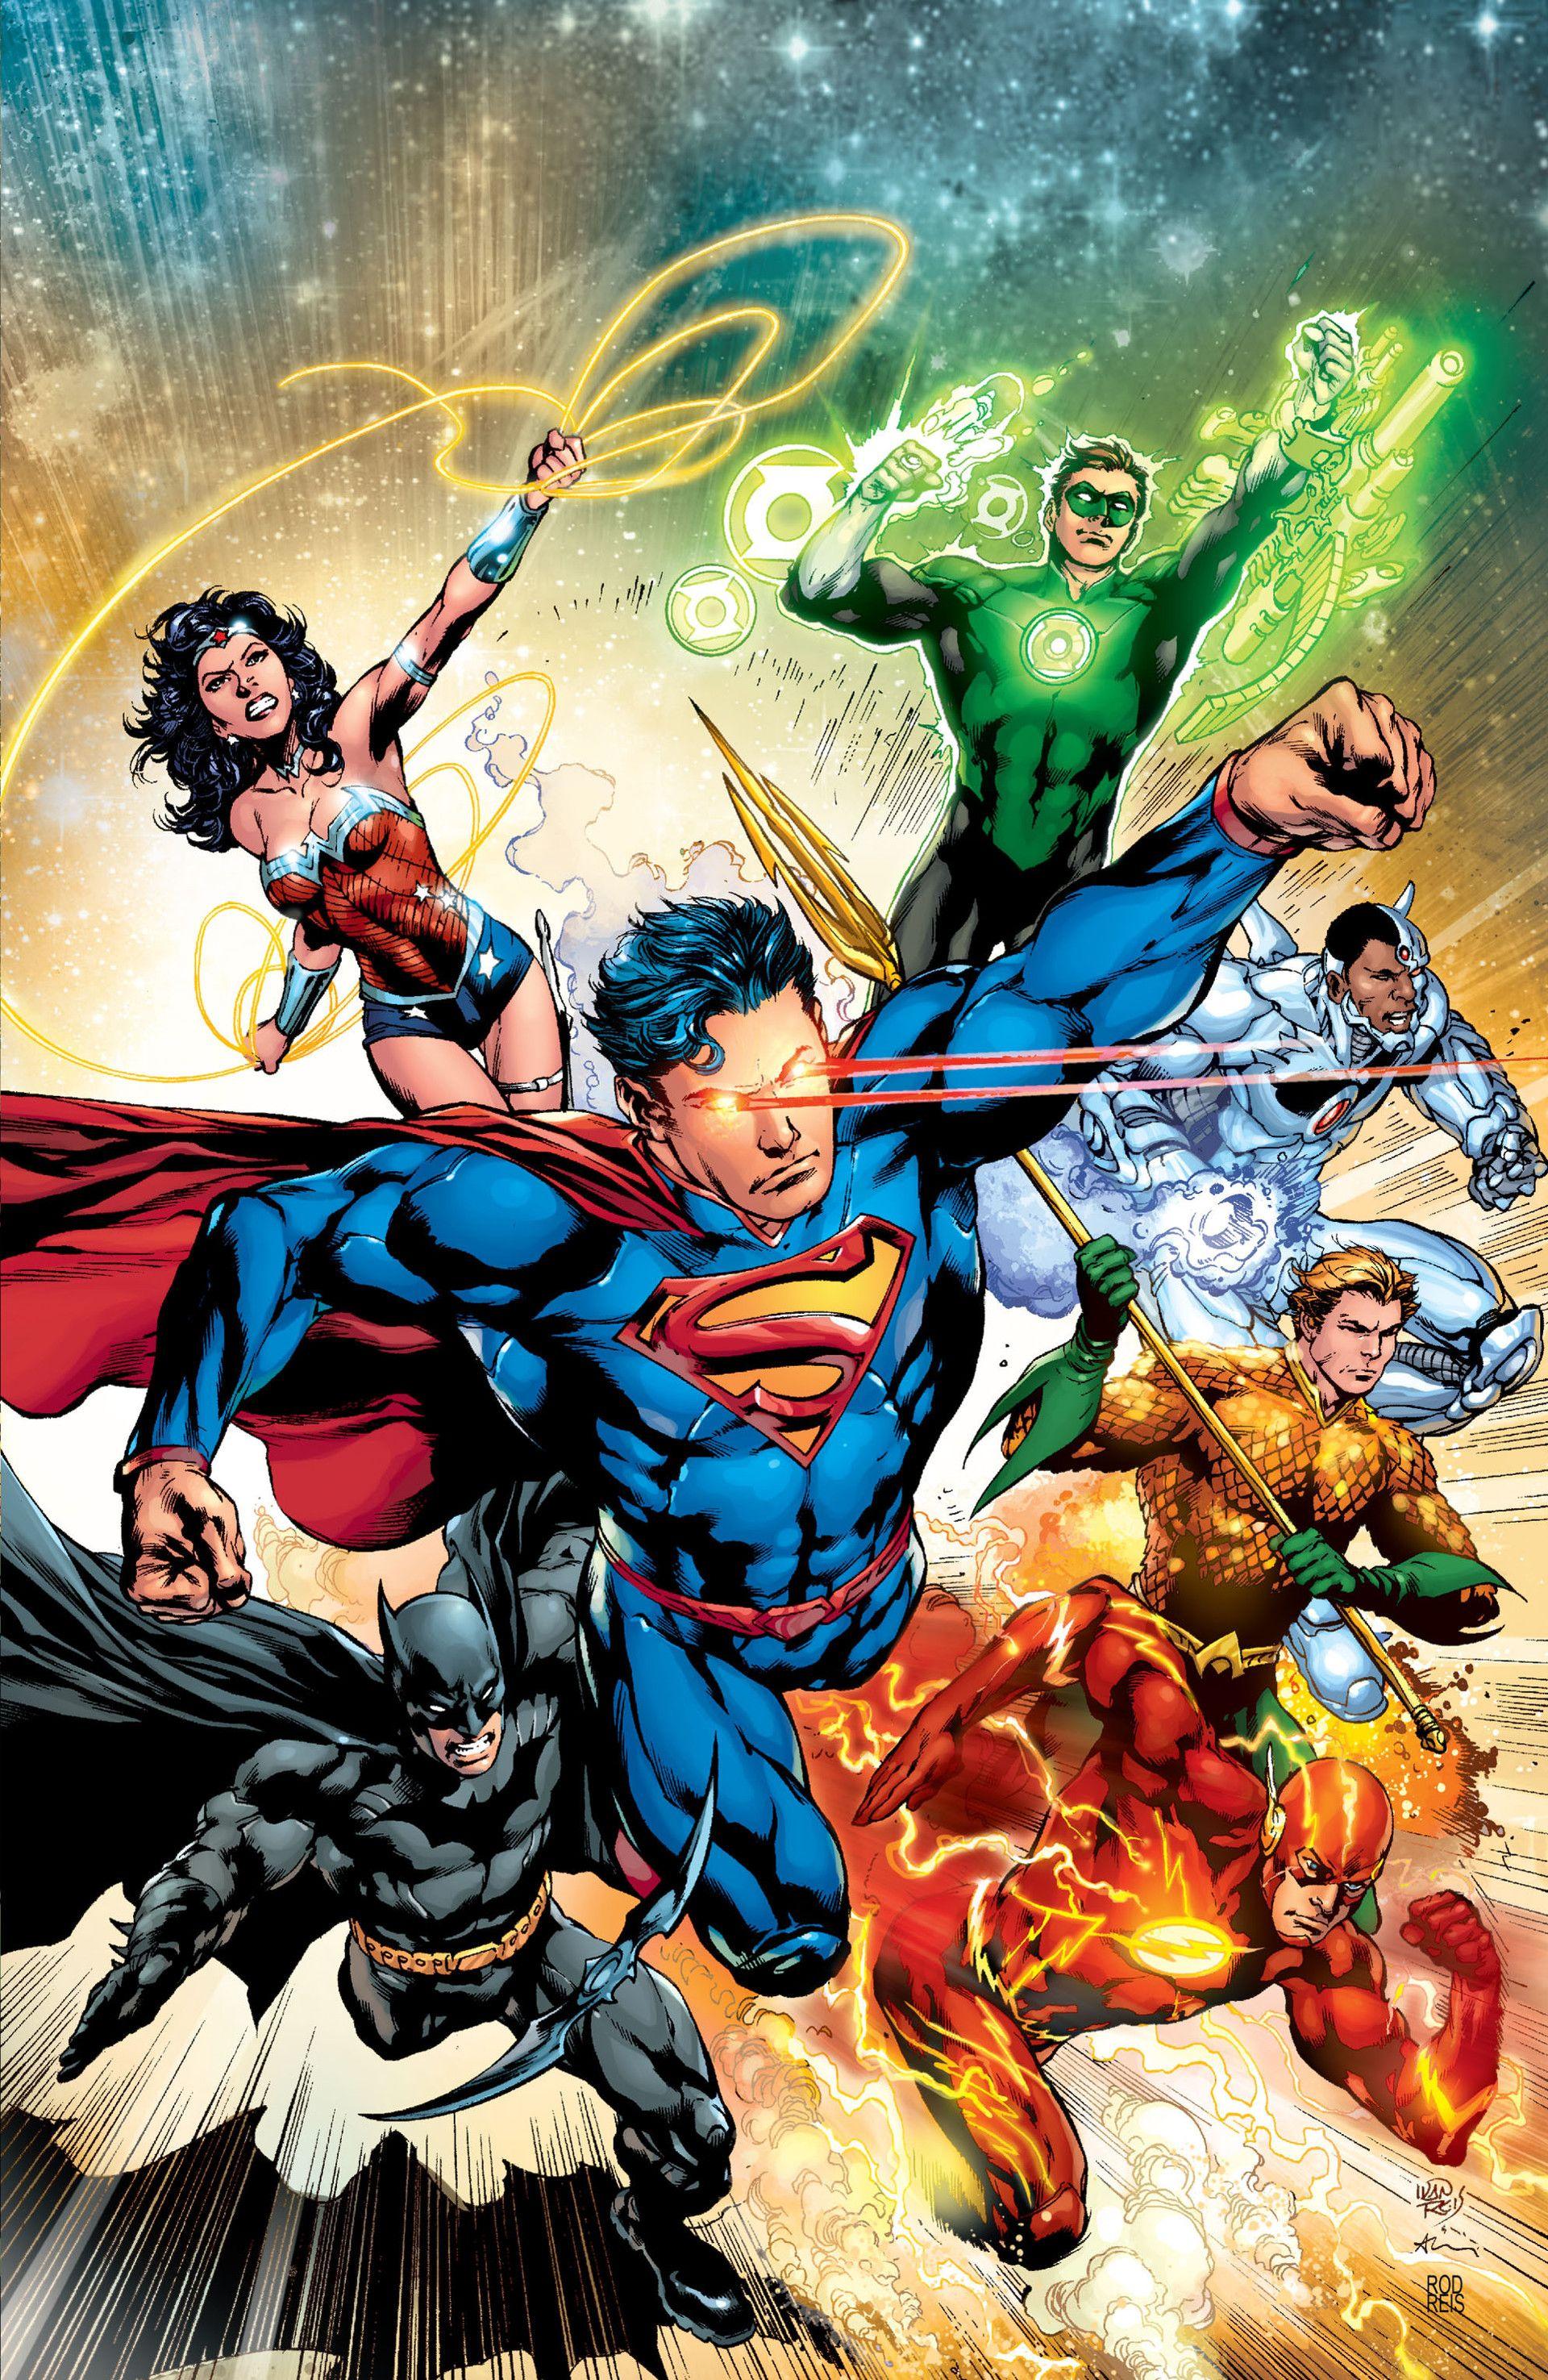 Dc Comics Justice League : Justice league vol comic and hero